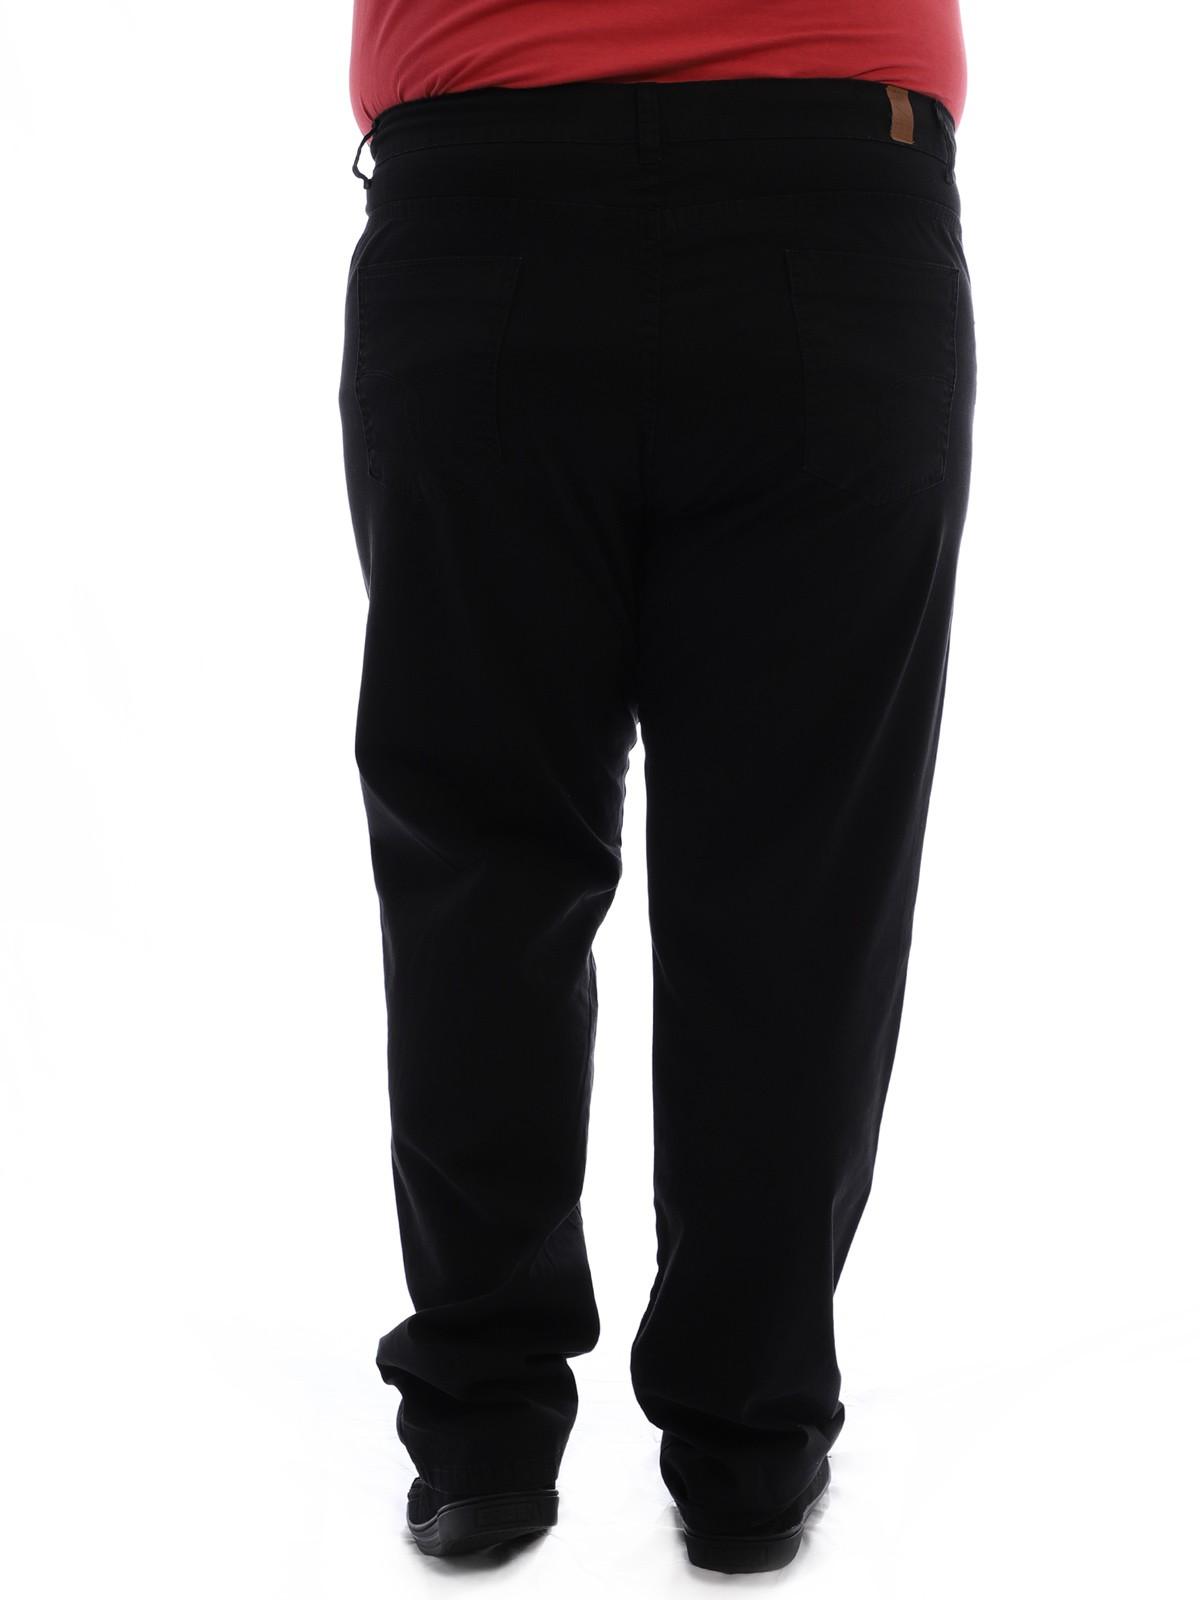 Calça Plus Size Masculina Sarja Tinturada Com Strech Preta